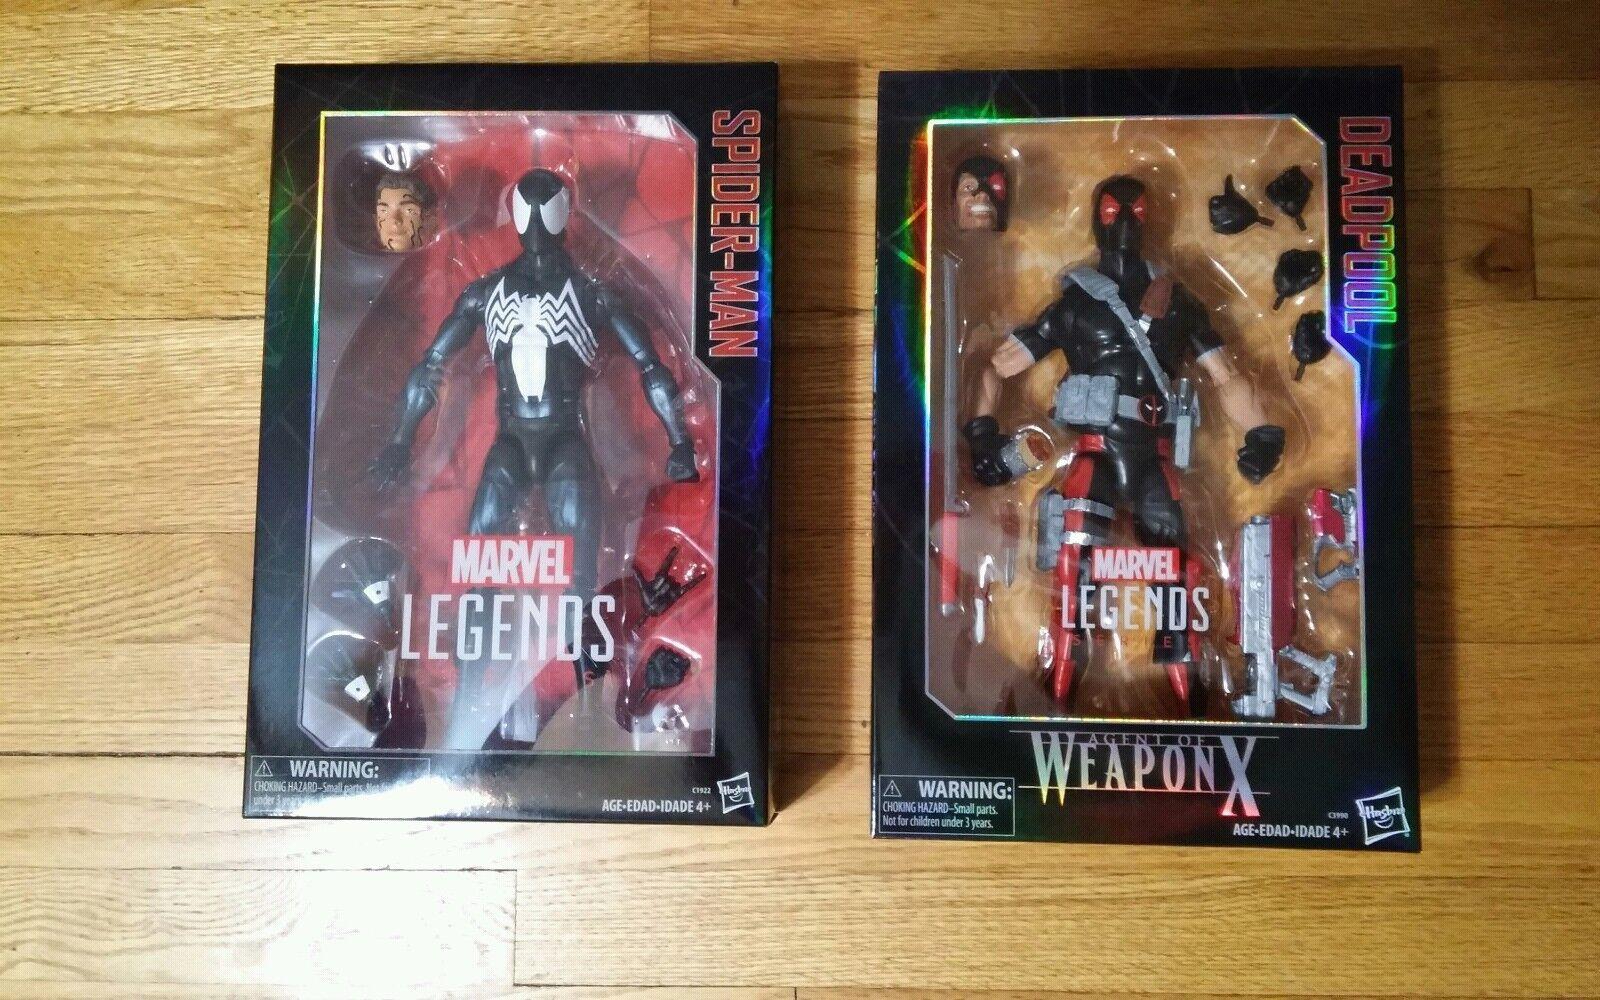 Marvel - legenden 12 - spider - man - symbiont & waffe x fr deadpool menge 2 nib